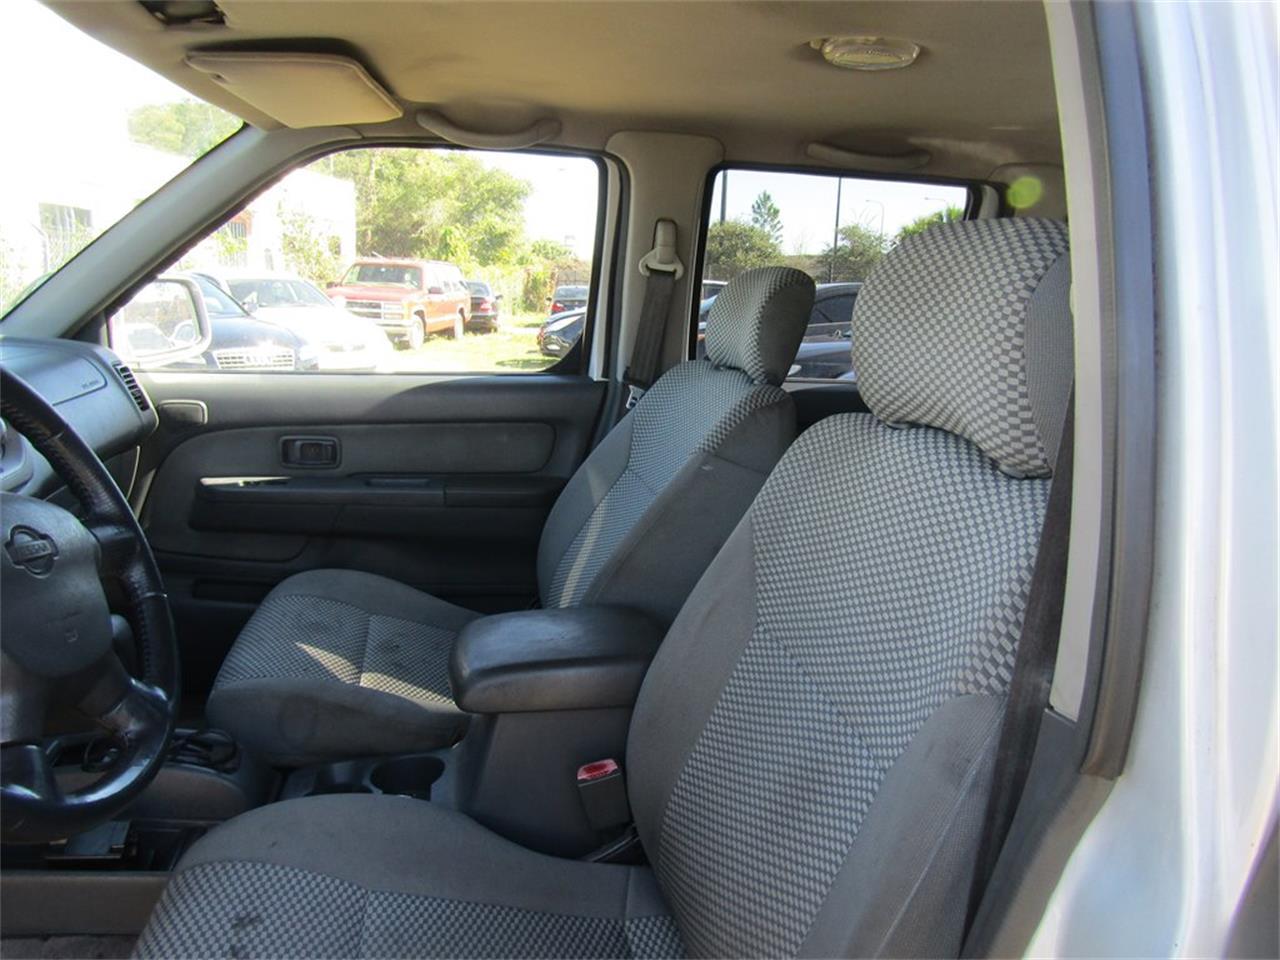 2001 Nissan Frontier (CC-1296432) for sale in Orlando, Florida